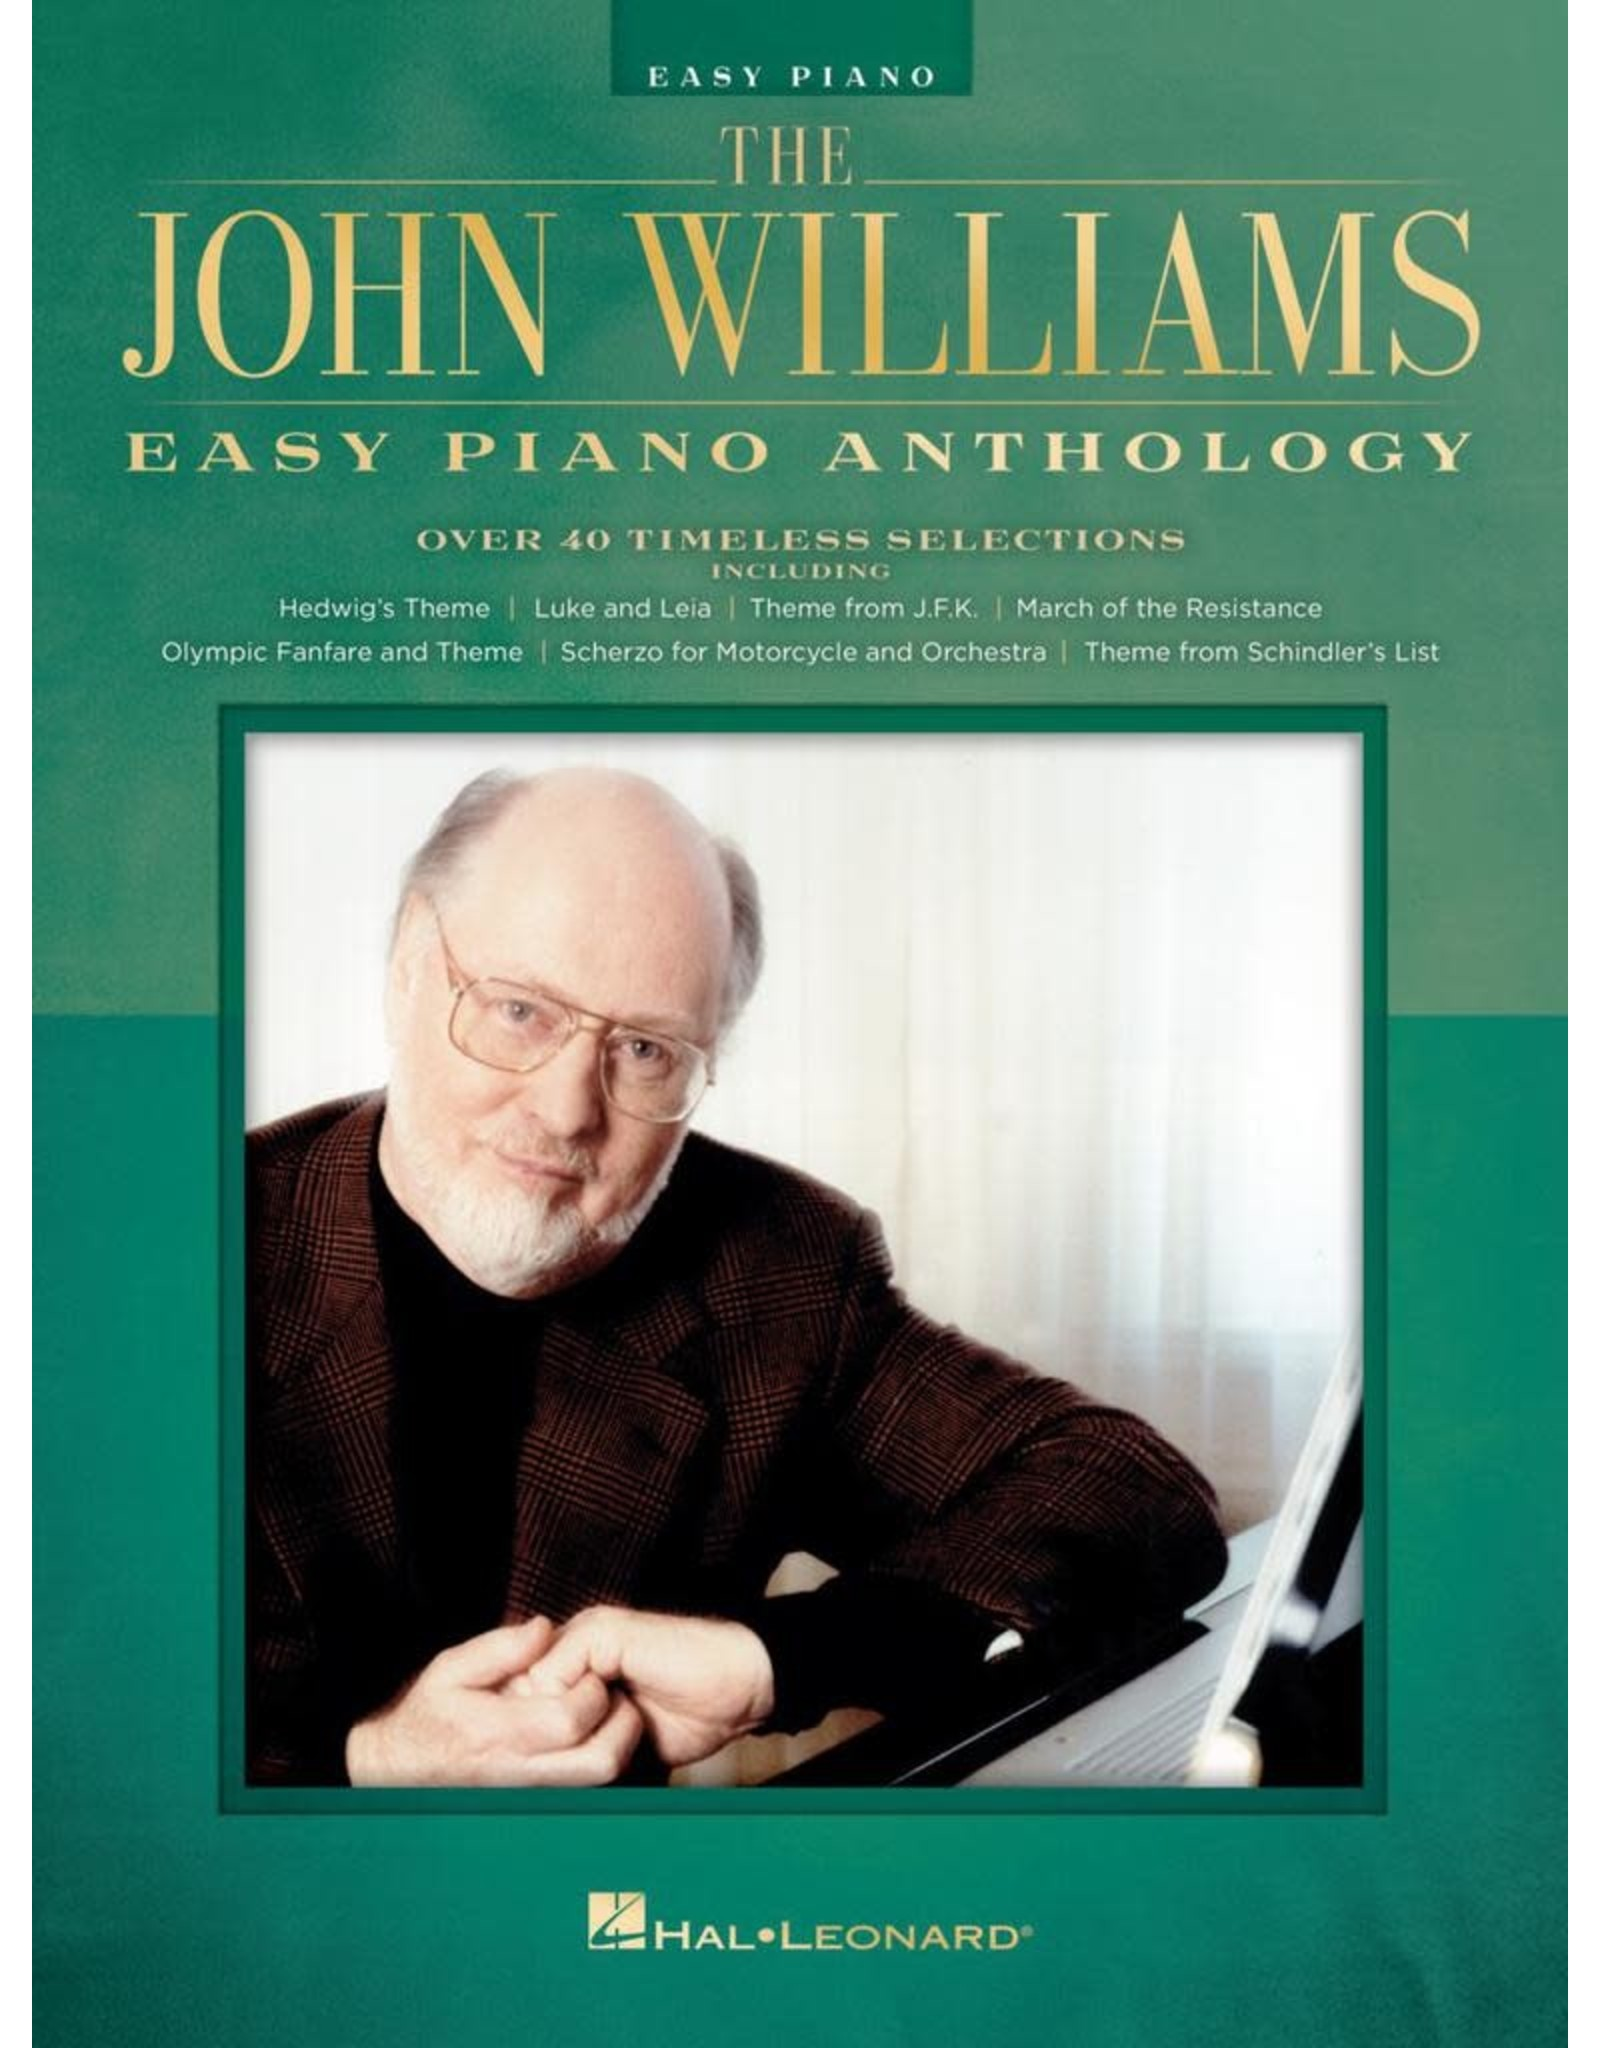 Hal Leonard John Williams Easy Piano Anthology